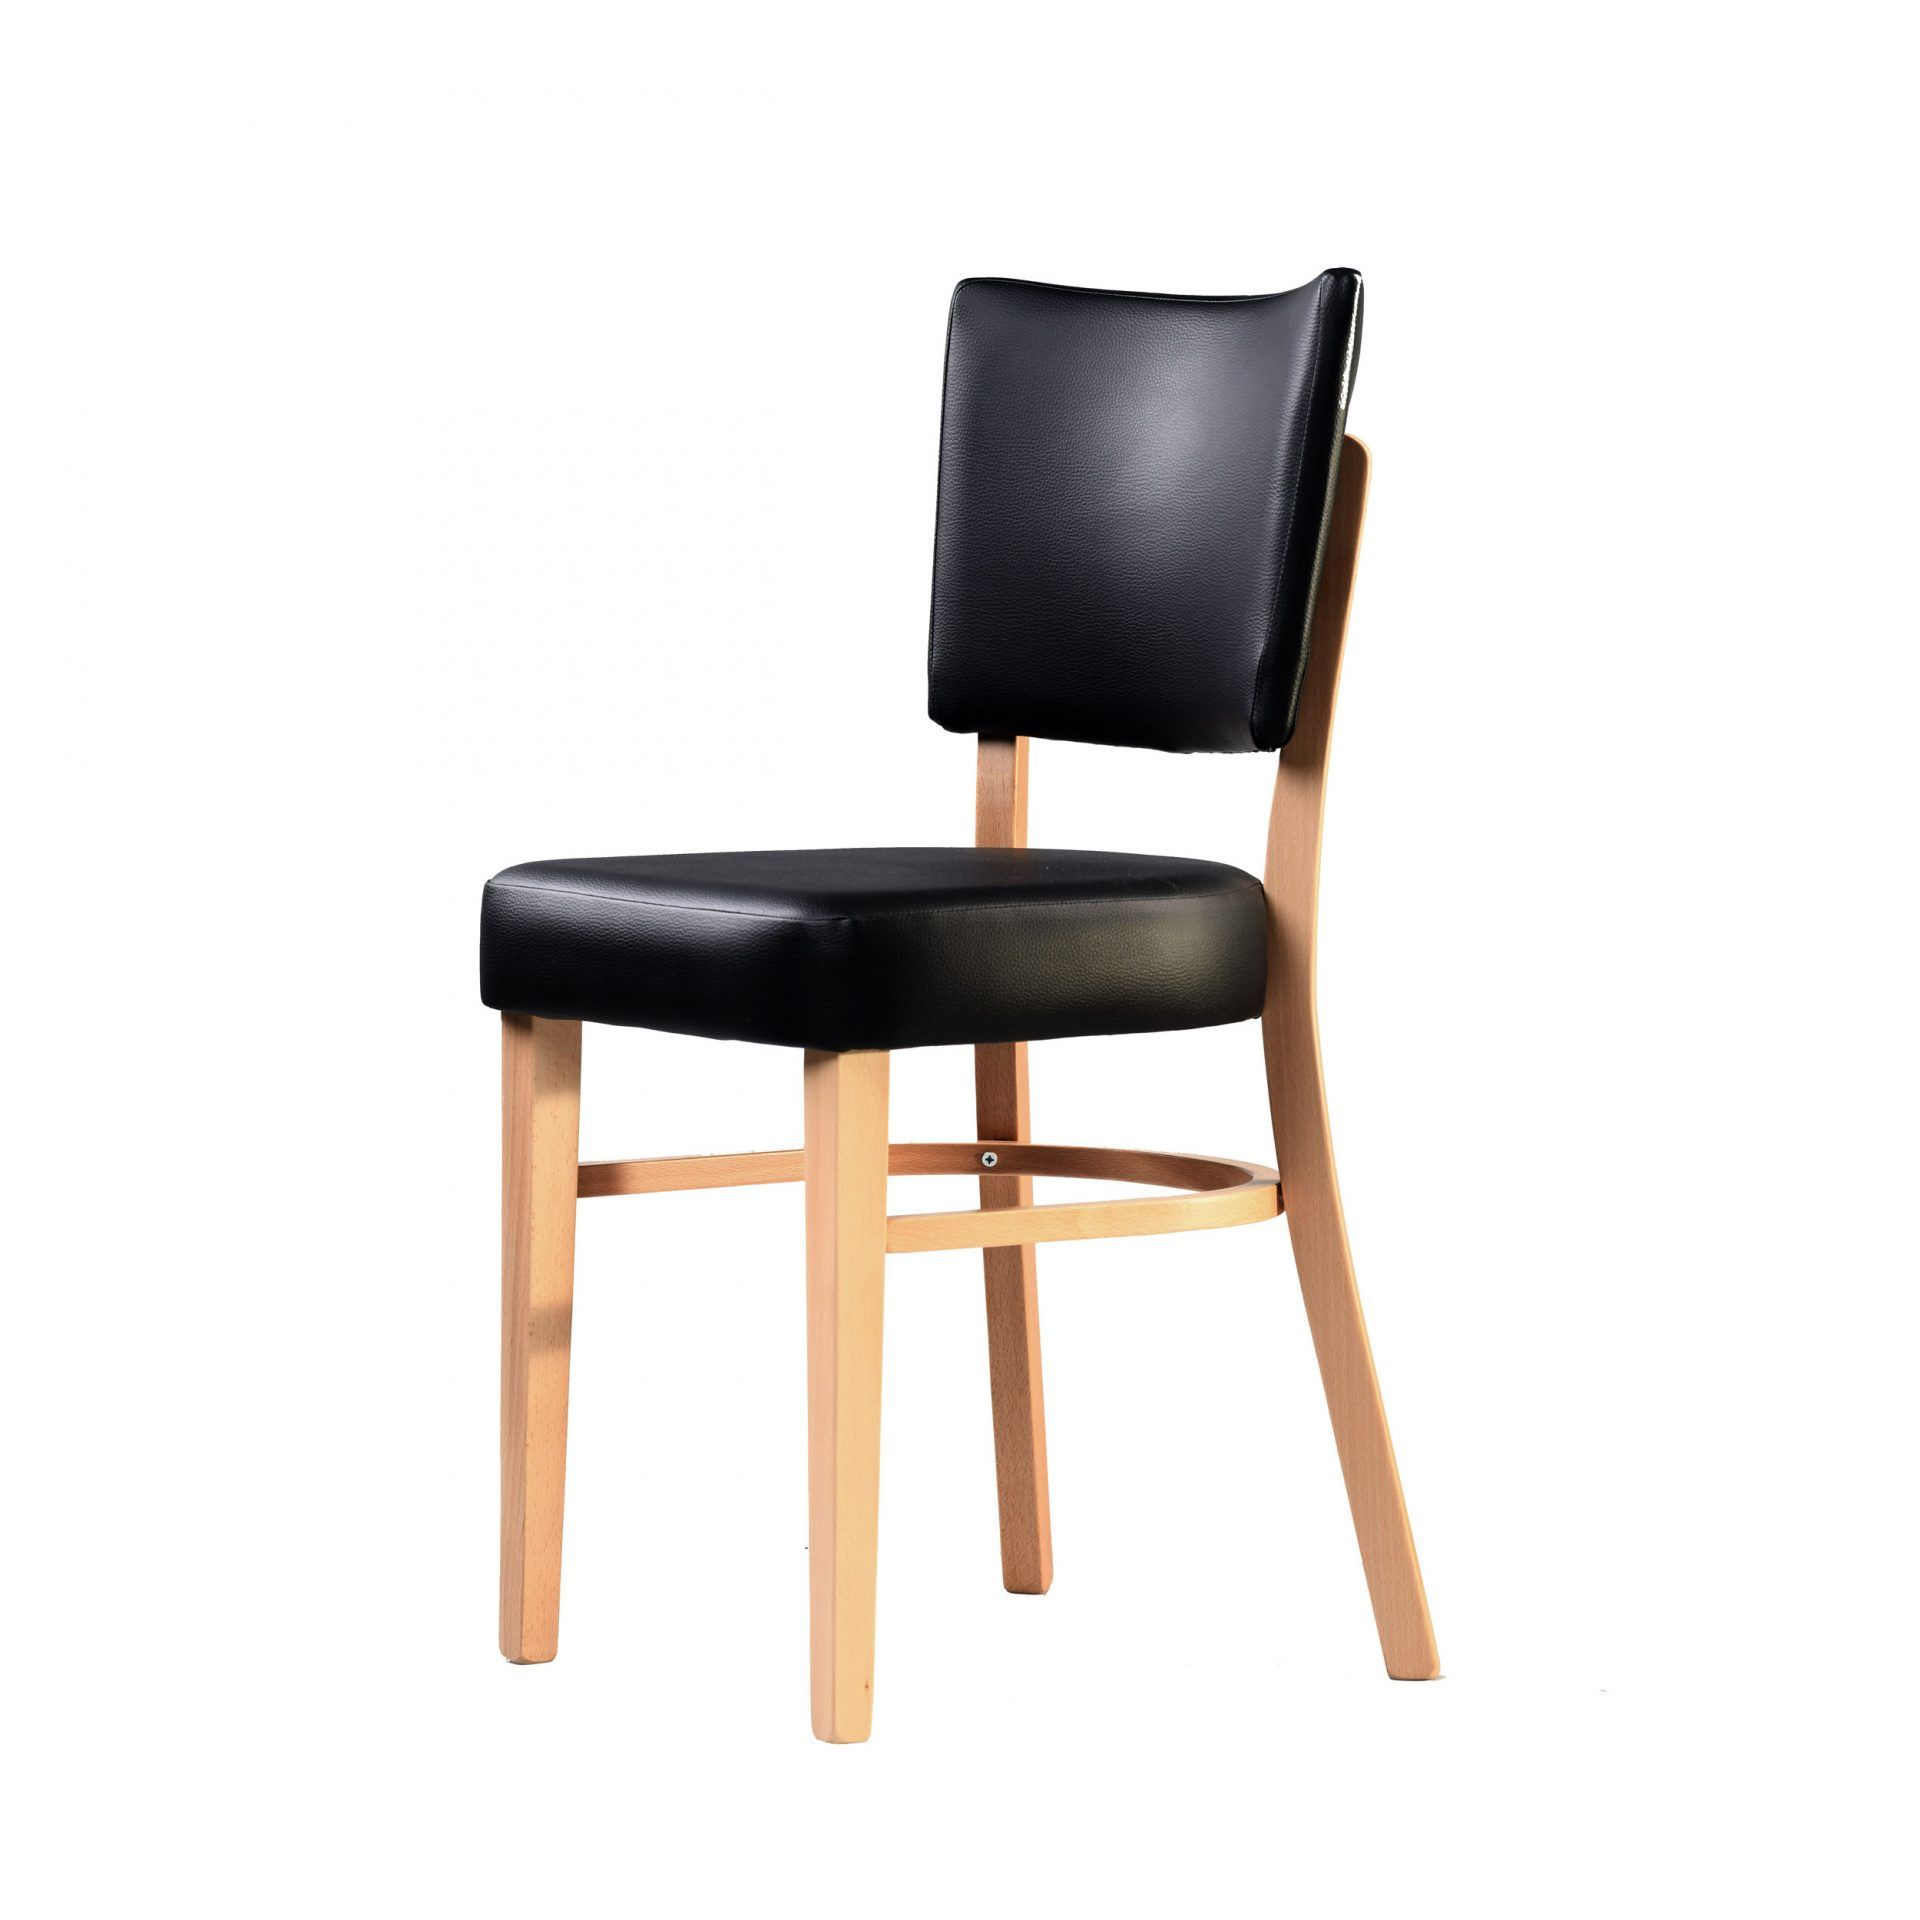 memphis chair black vinyl seat and backrest natural frame front left